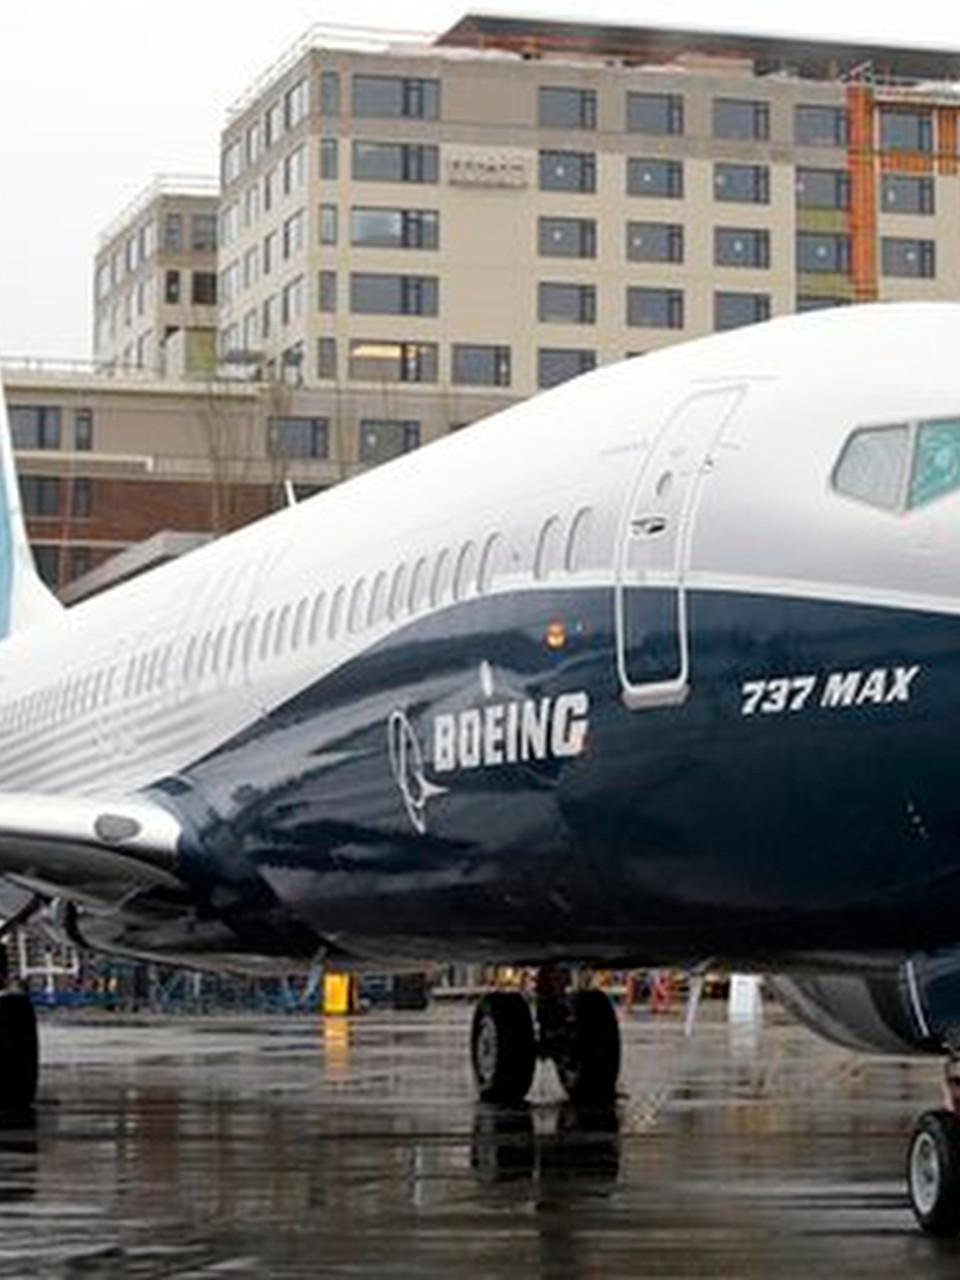 Boeing Halts Test Flights Of New 737 Max Plane Over Engine Issue Komo